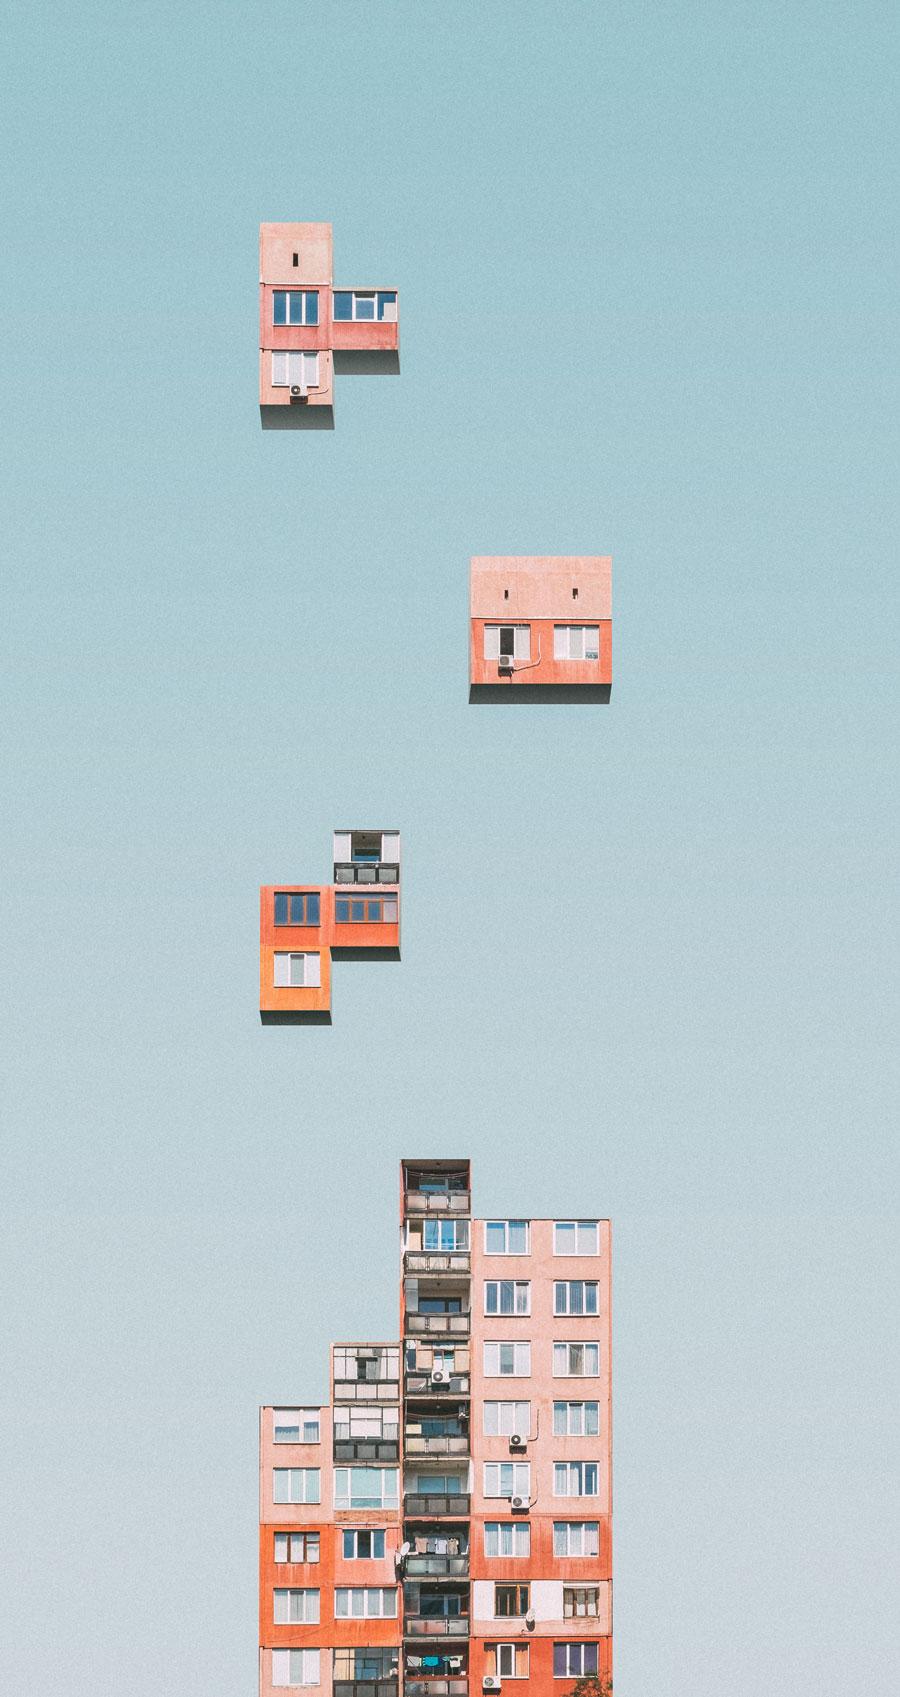 Urban Tetris by Mariyan Atanasov transforms high-rise blocks